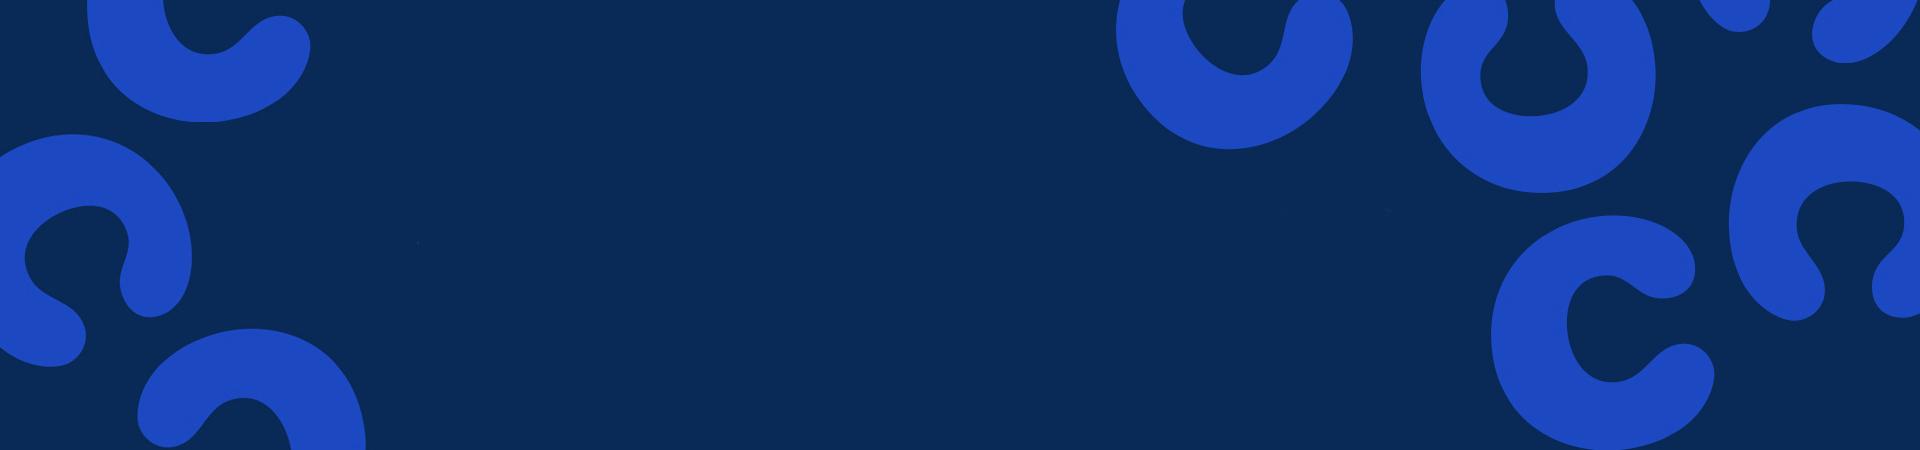 A blue banner image